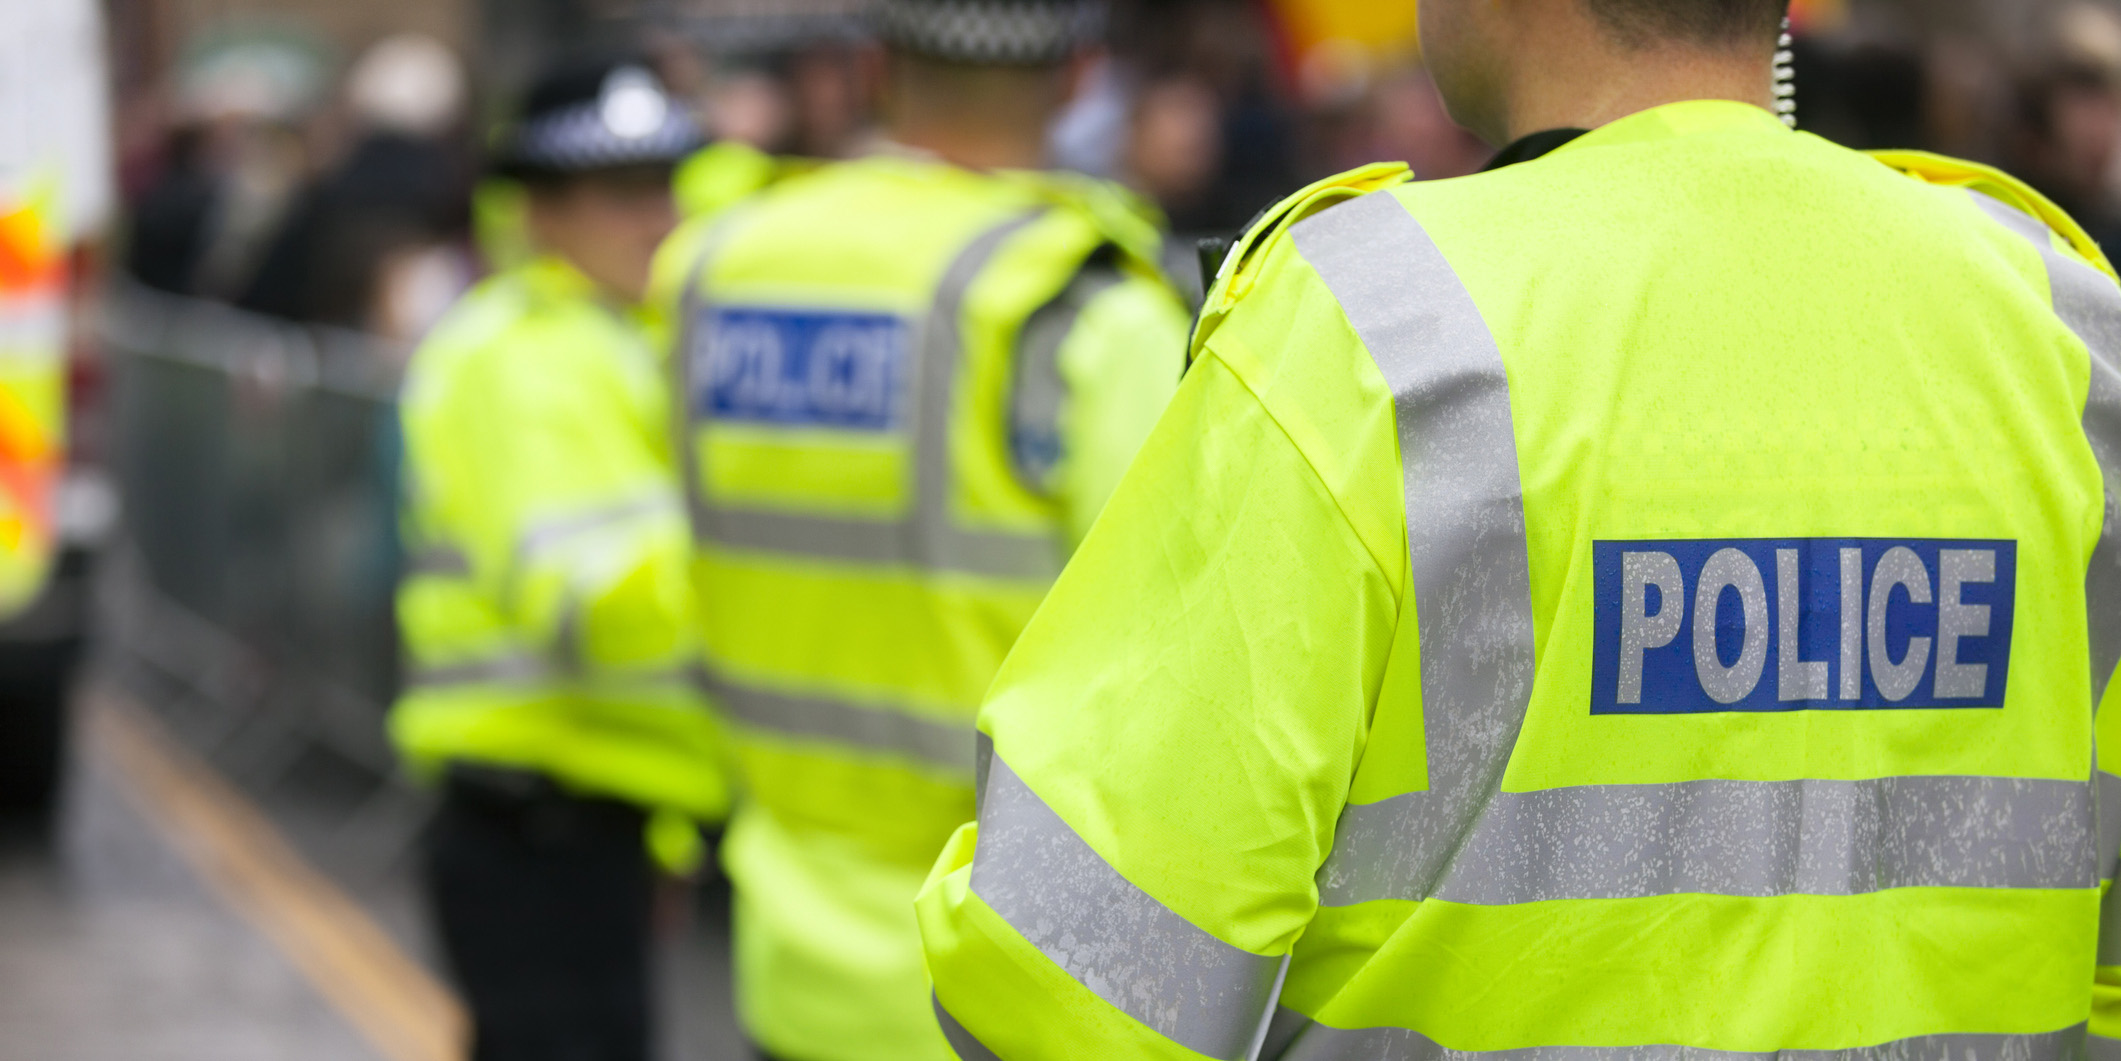 police-in-high-vis